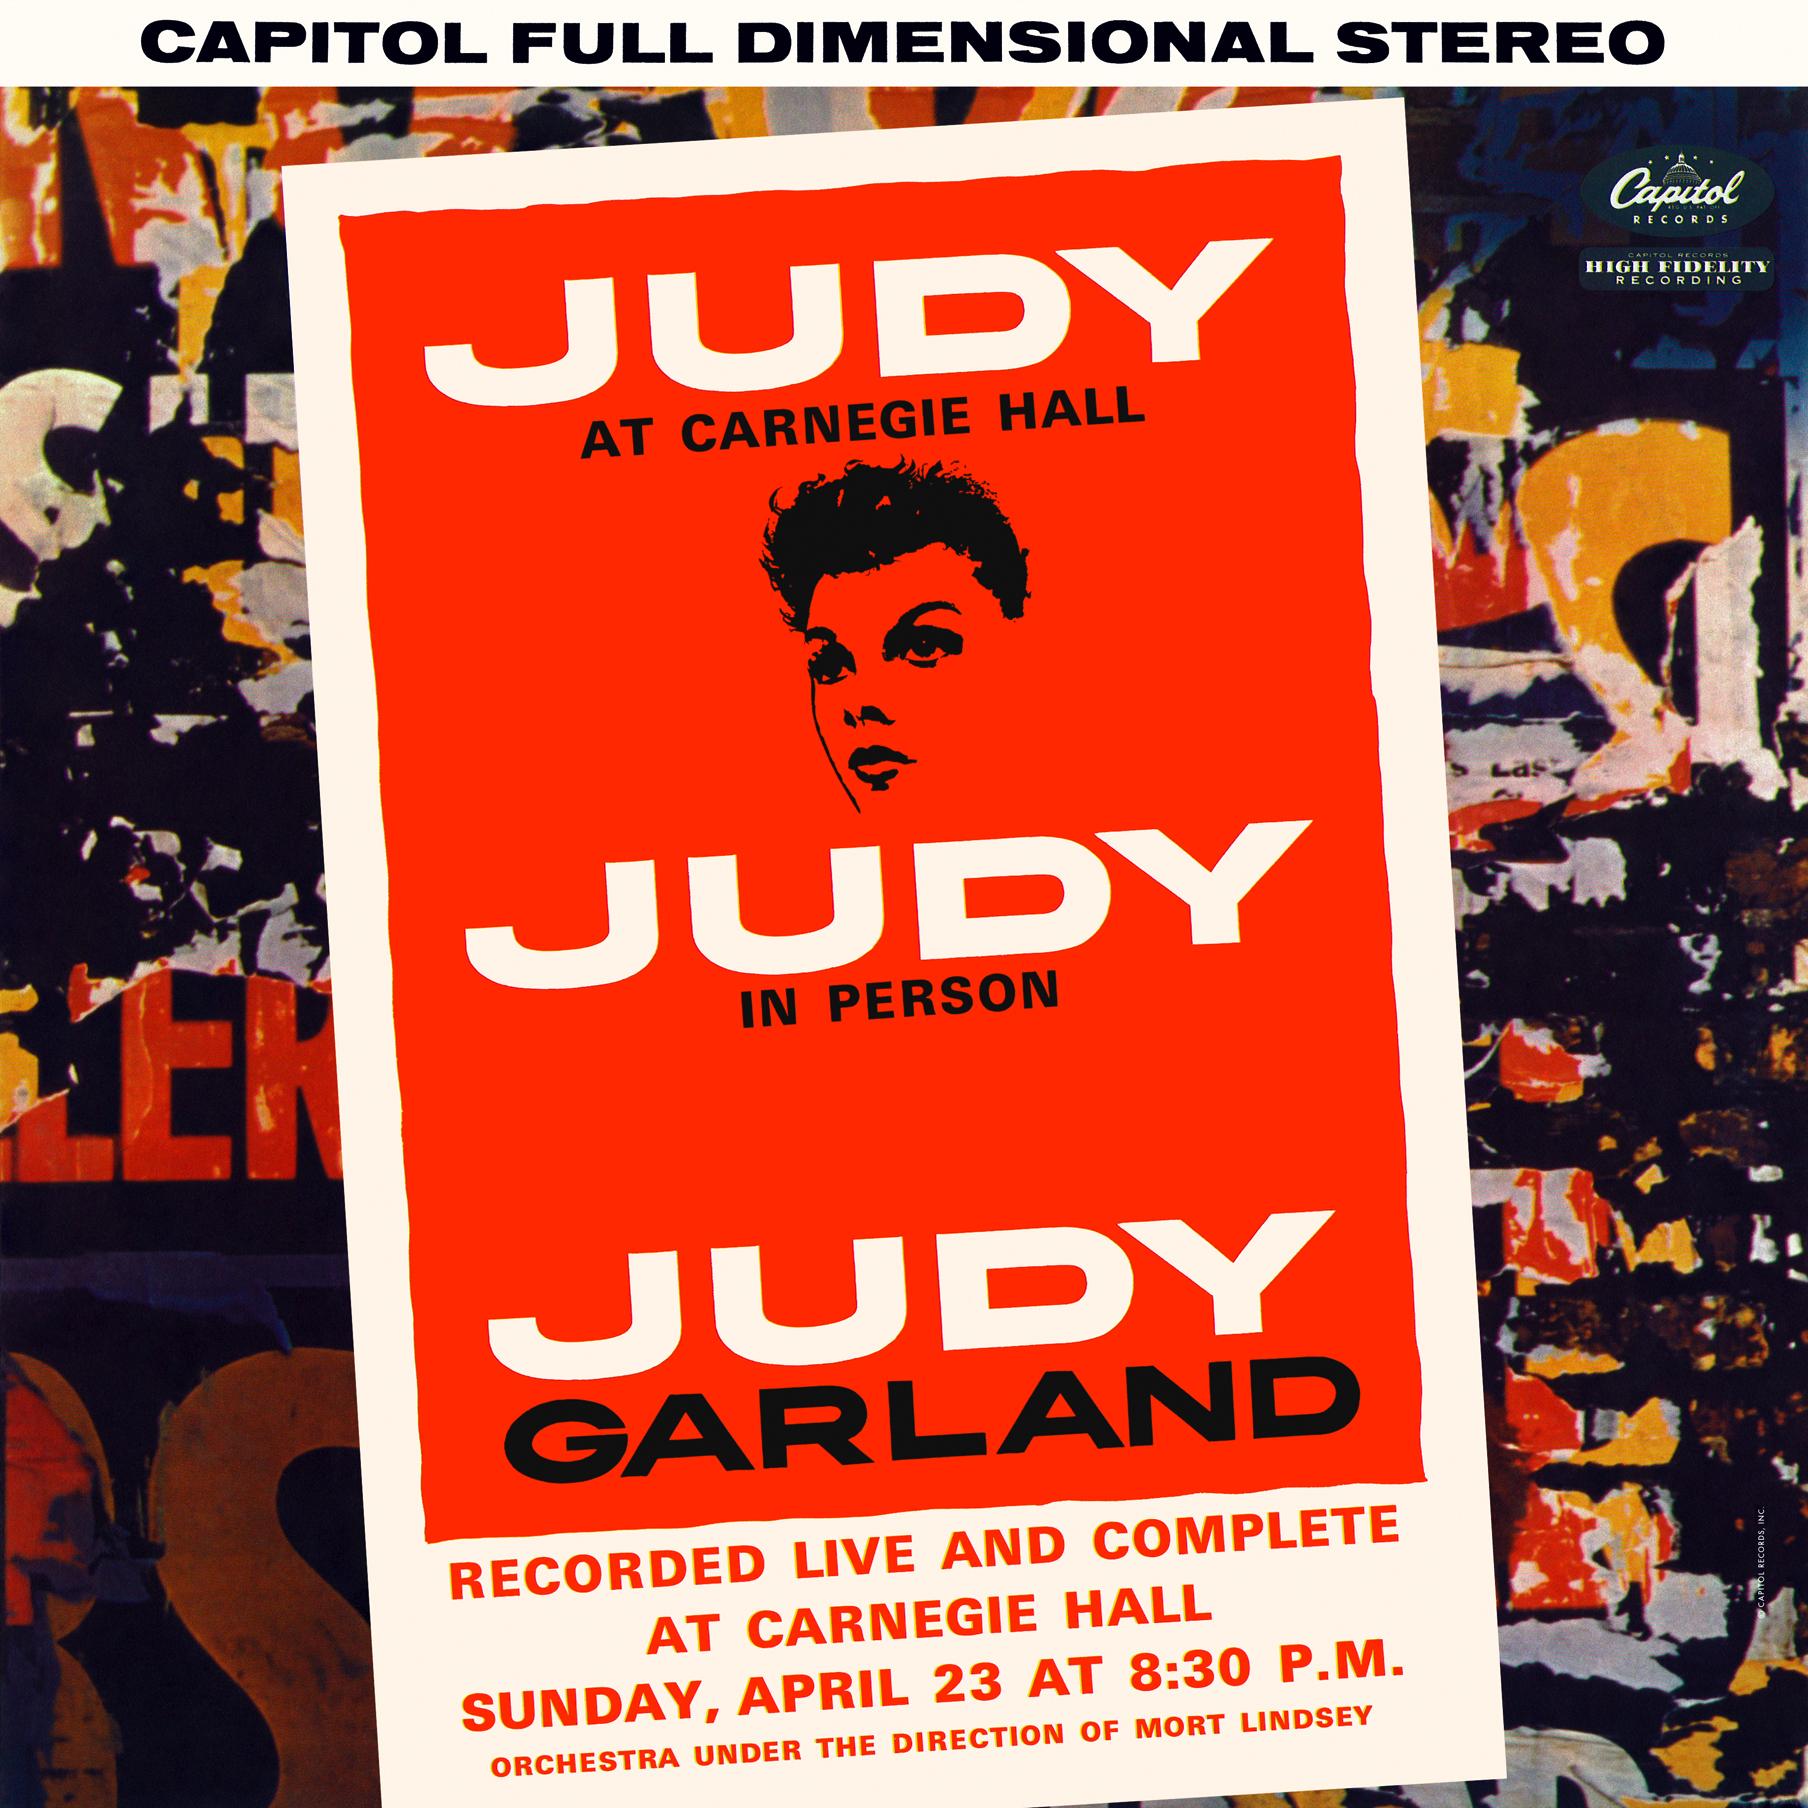 Bbc2 Radio To Air New Judy At Carnegie Hall Documentary